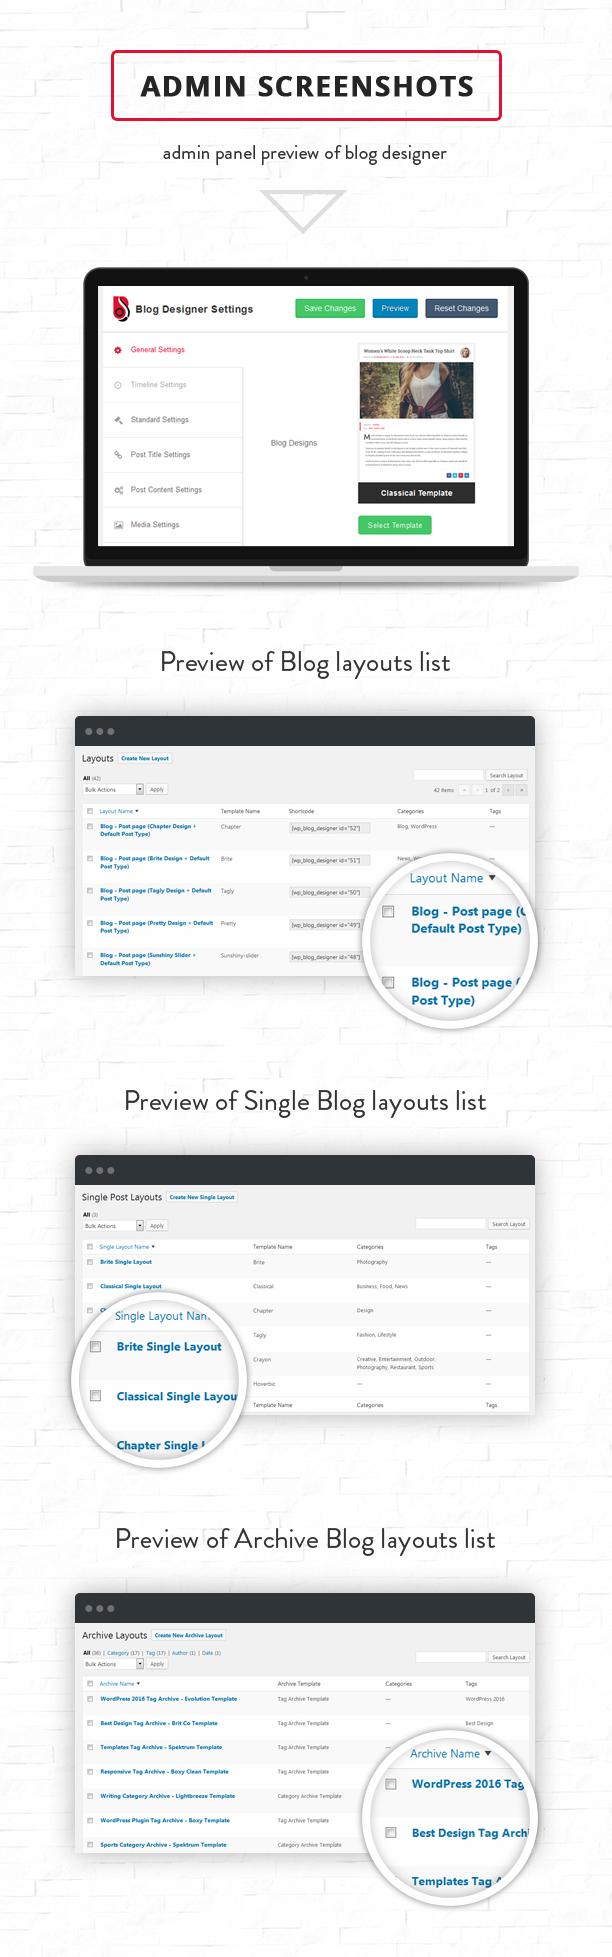 Blog layout settings